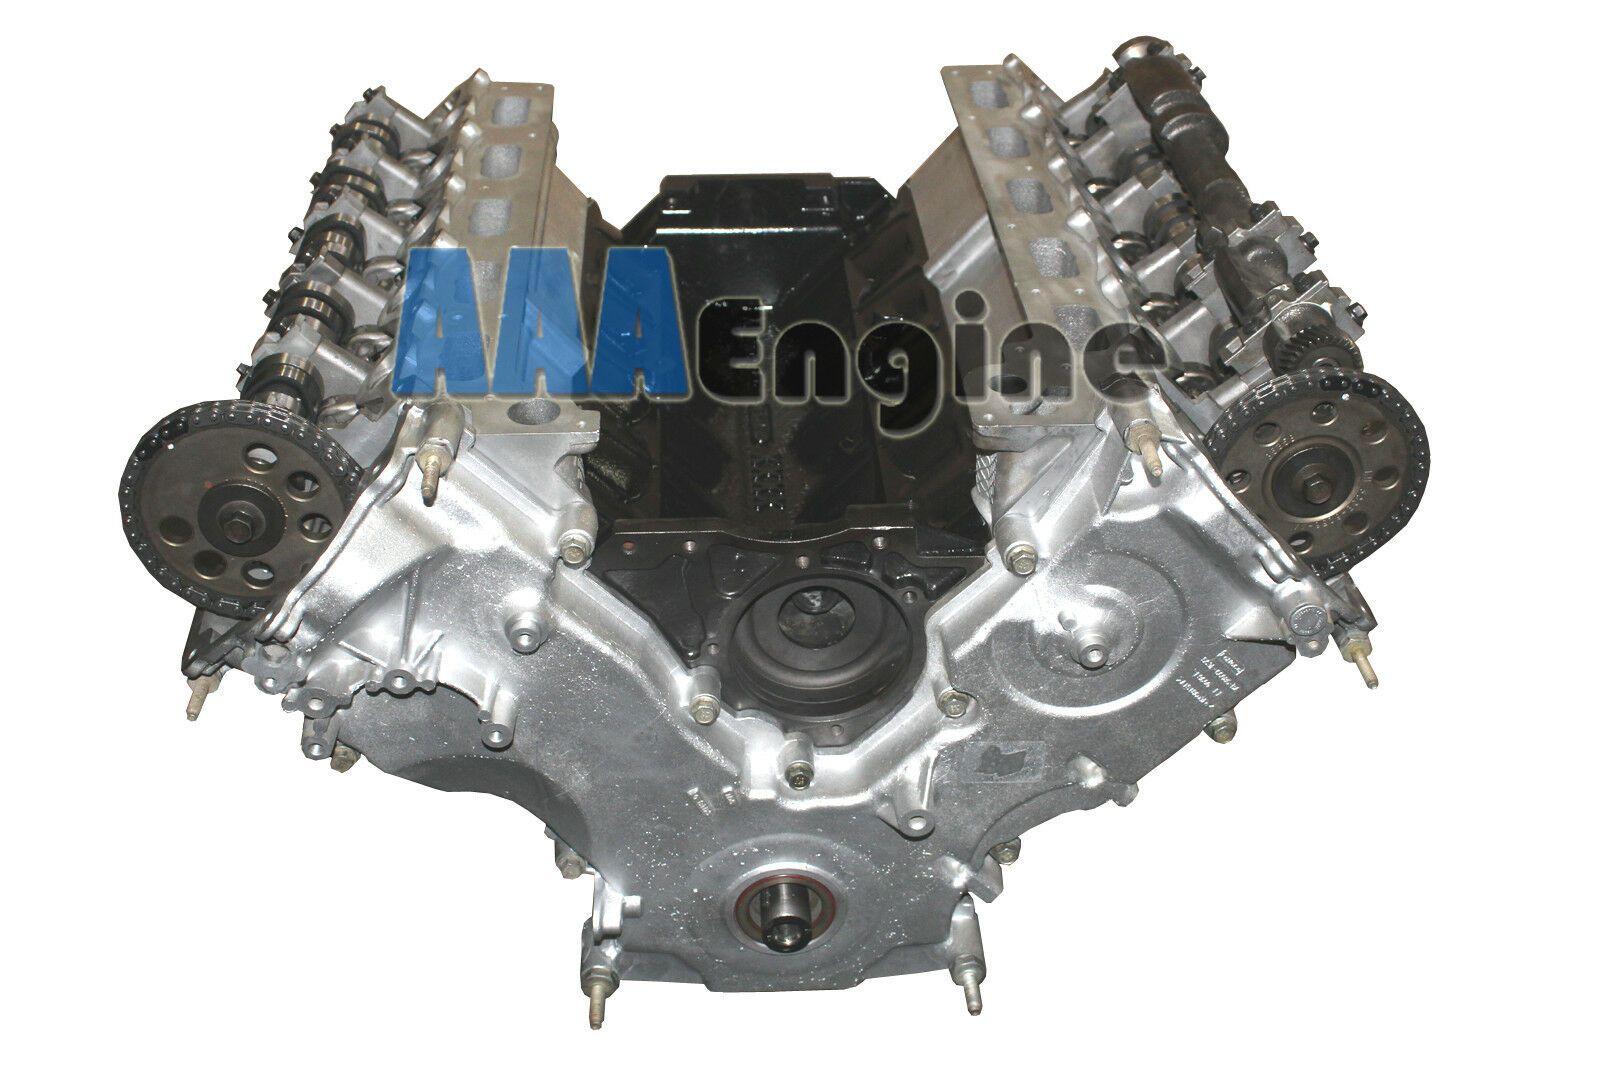 V10 Engine In 2020 With Images V10 Engine Engineering Valve Cover